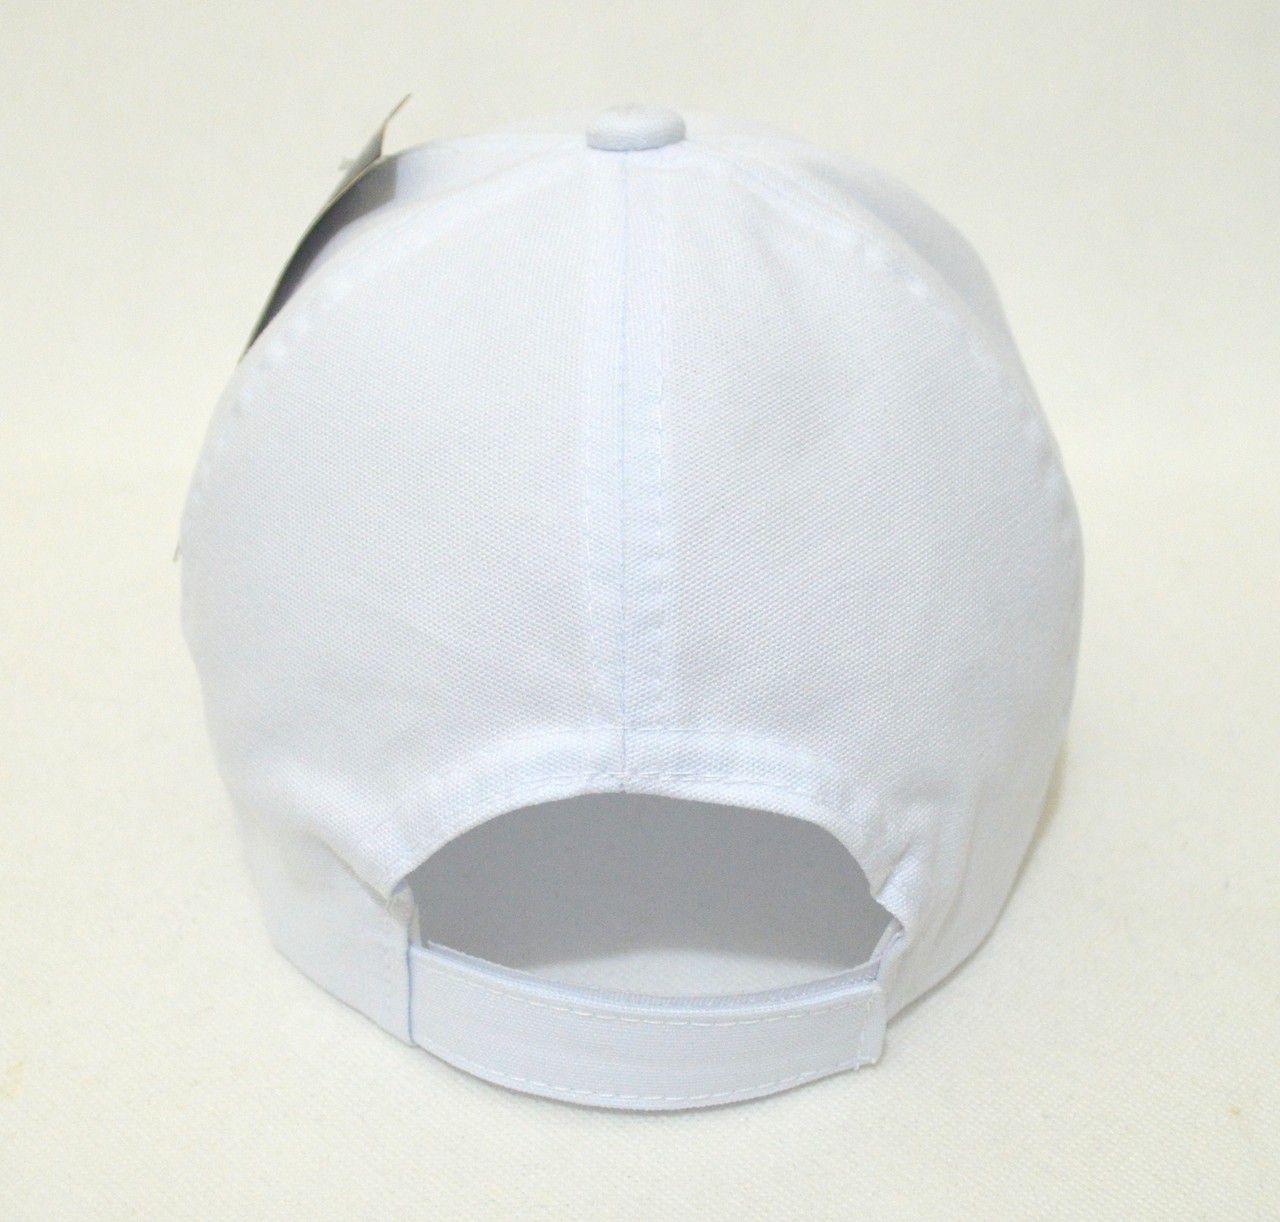 Boné Branco Liso Unisex Super Leve Top - Aba Curva